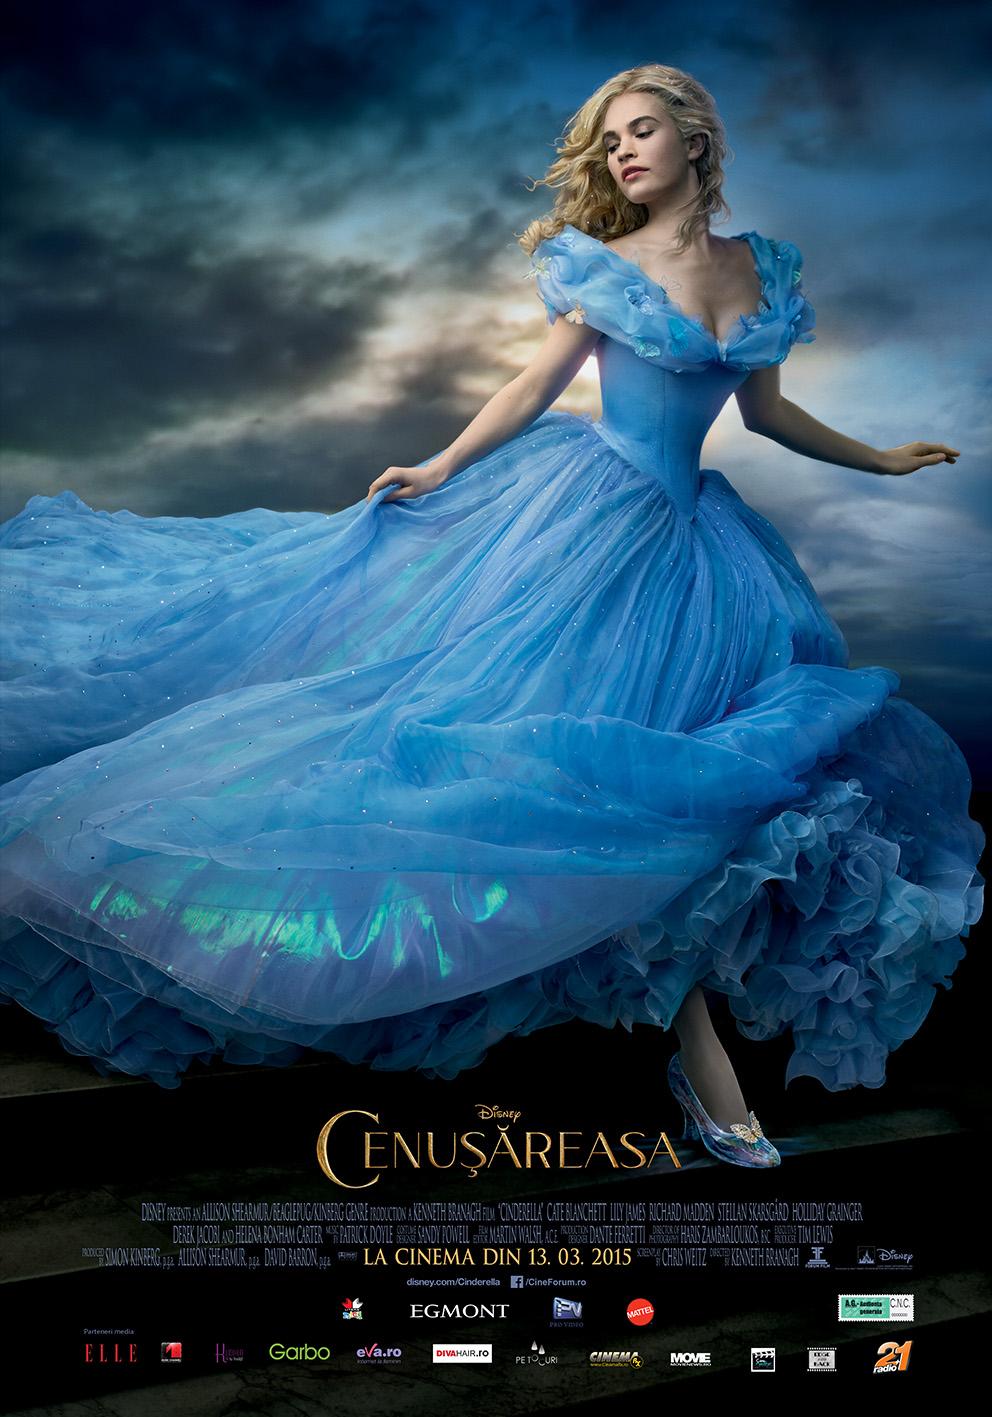 Cenusareasa – 2D Dublat / Cinderella – 2D Dubbed (Premiera)